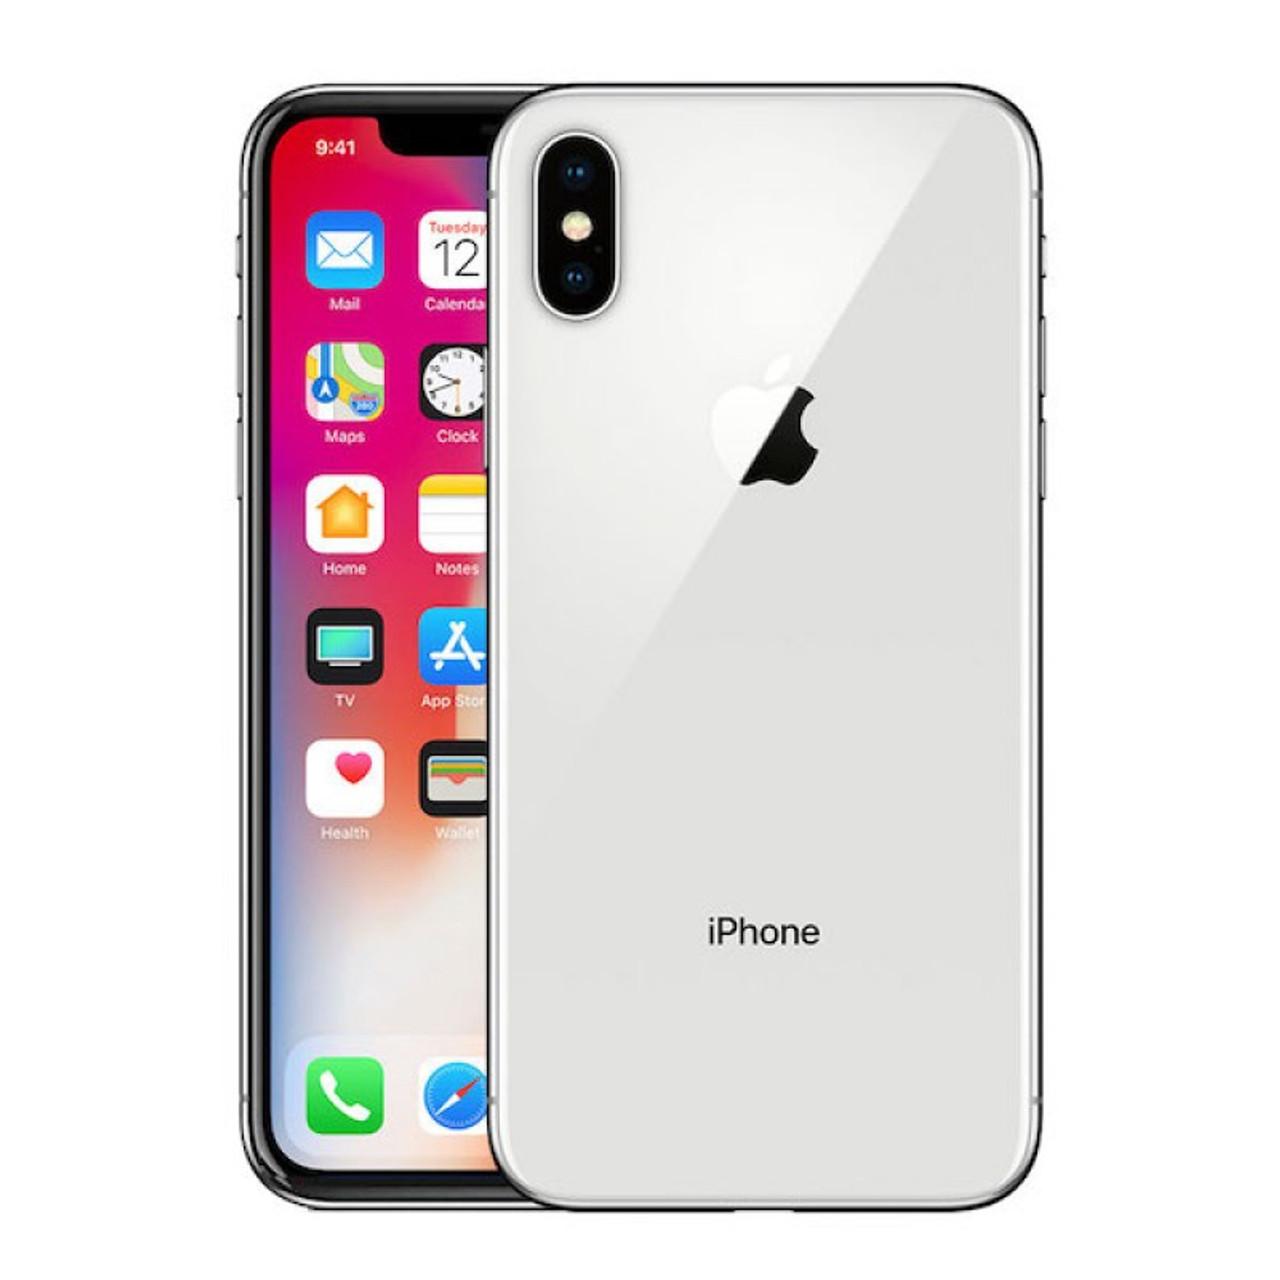 APPLE IPHONE X 256GB VERIZON CPO A STOCK UNLOCKED - SILVER